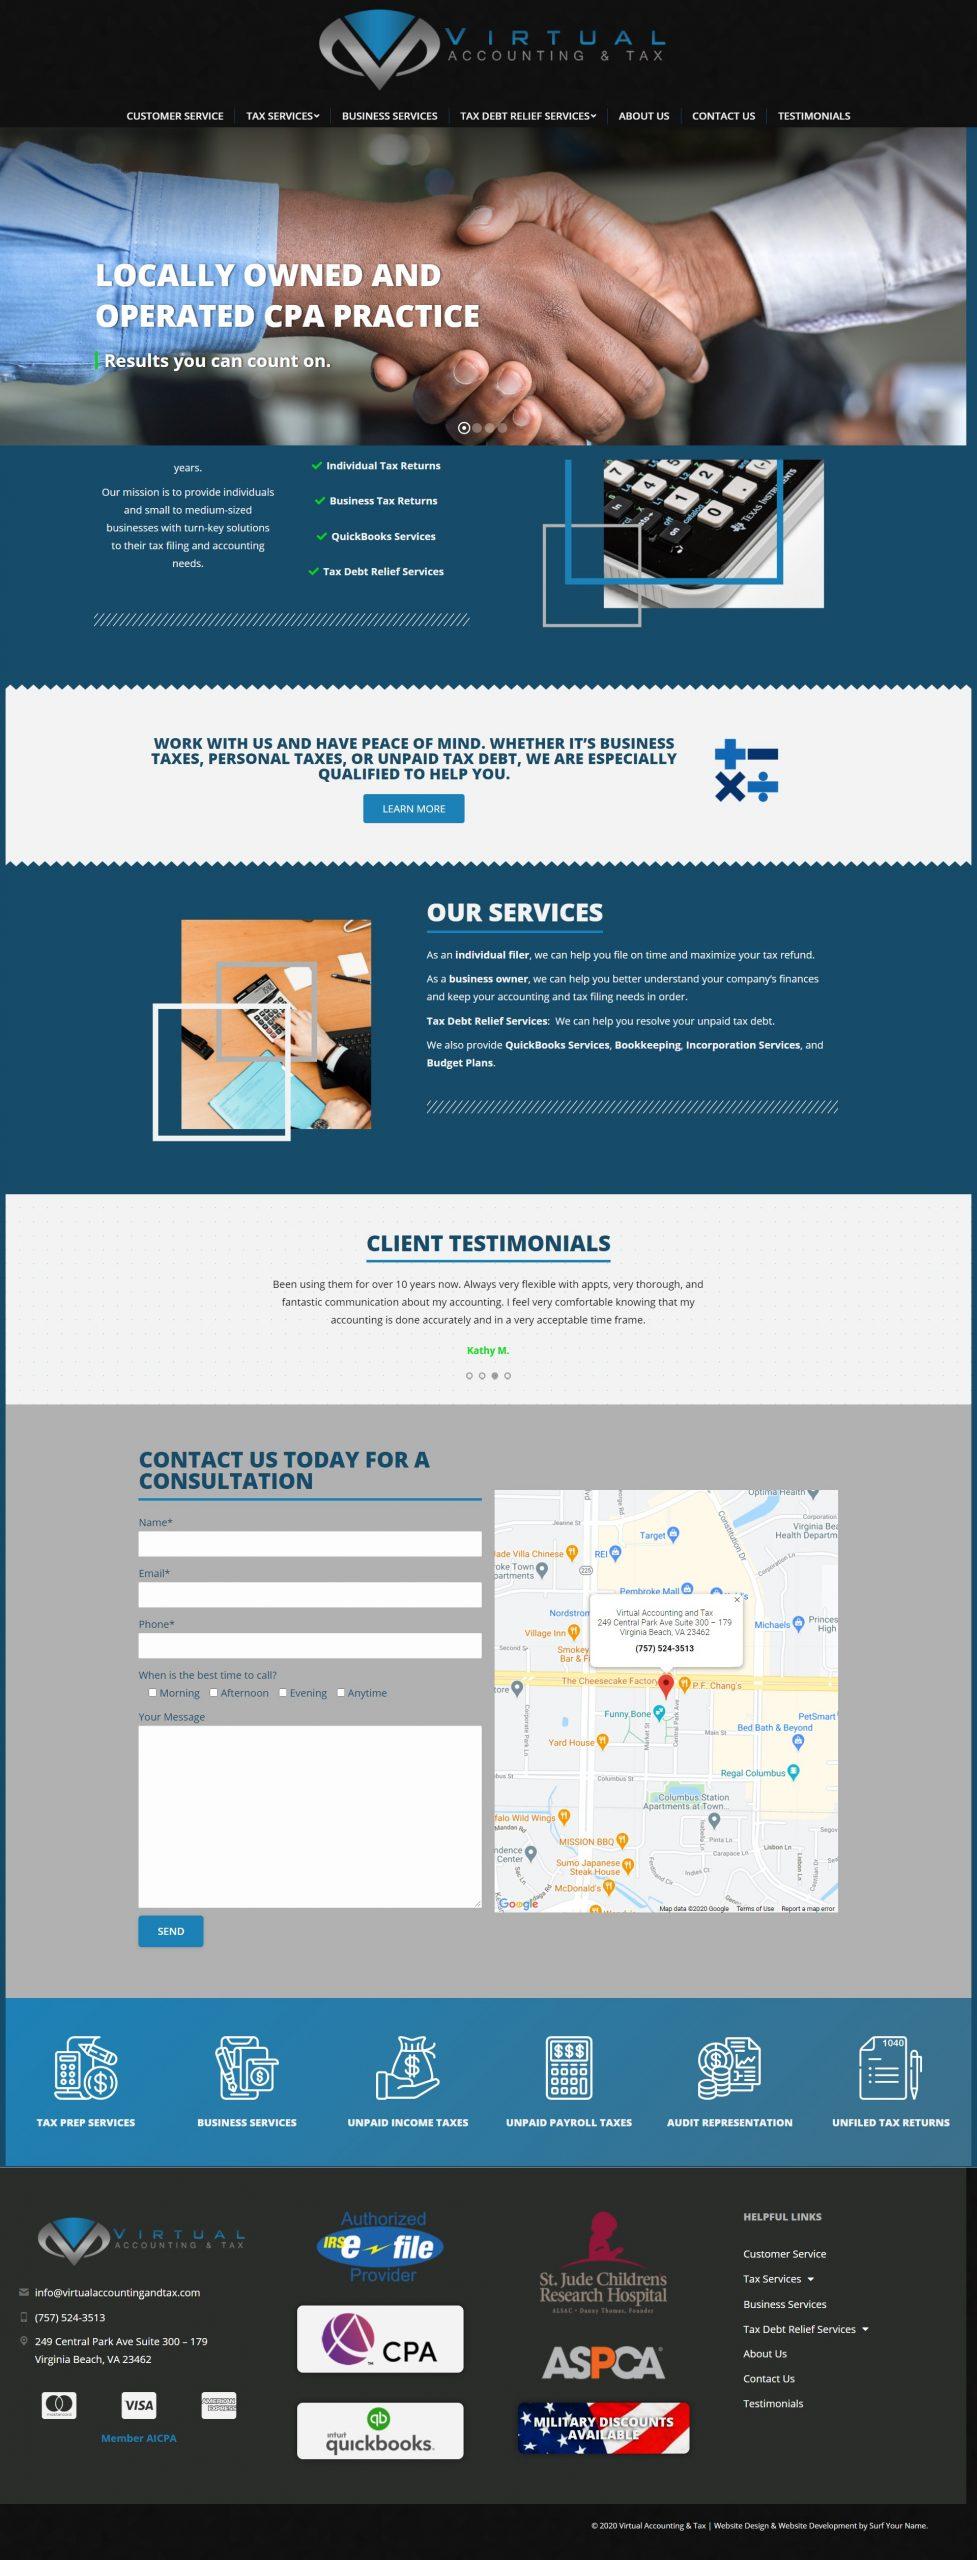 Virtual Accounting and Tax - Norfolk Web Design - Virginia Web Design - Hampton Roads Web Development